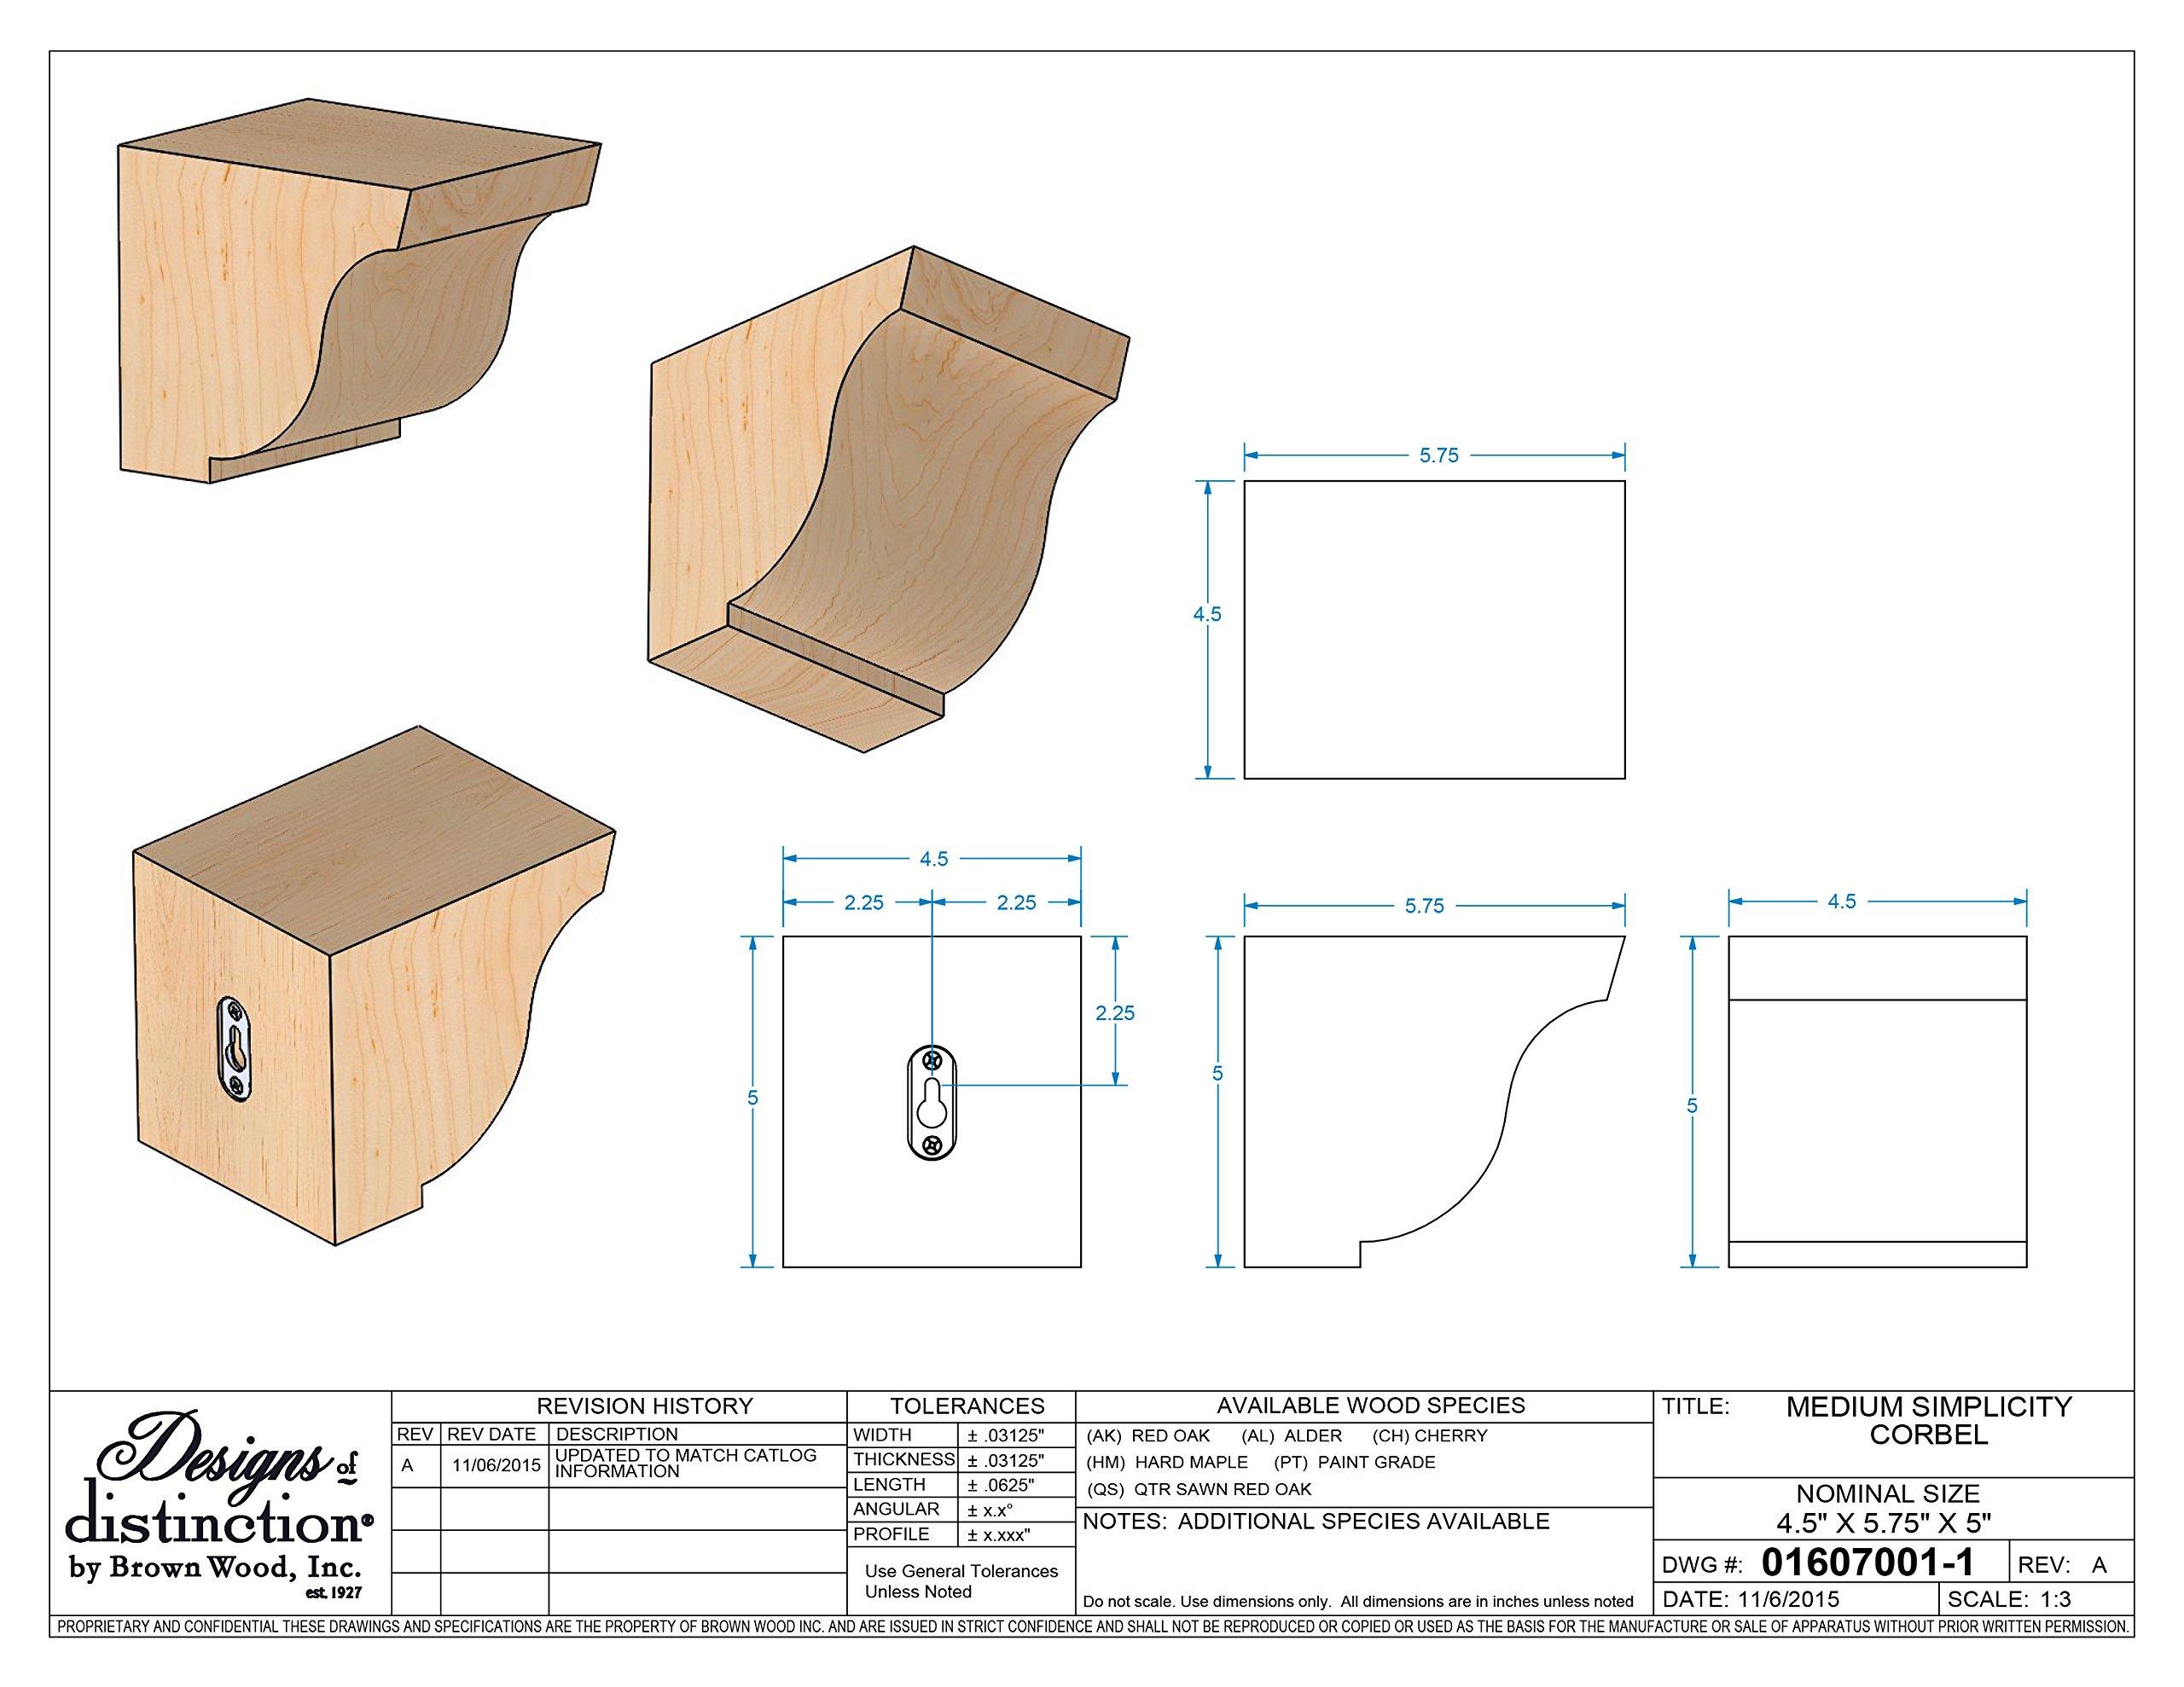 Brown Wood Inc. 01607001AK1 Simplicity Wood Corbel, Red Oak